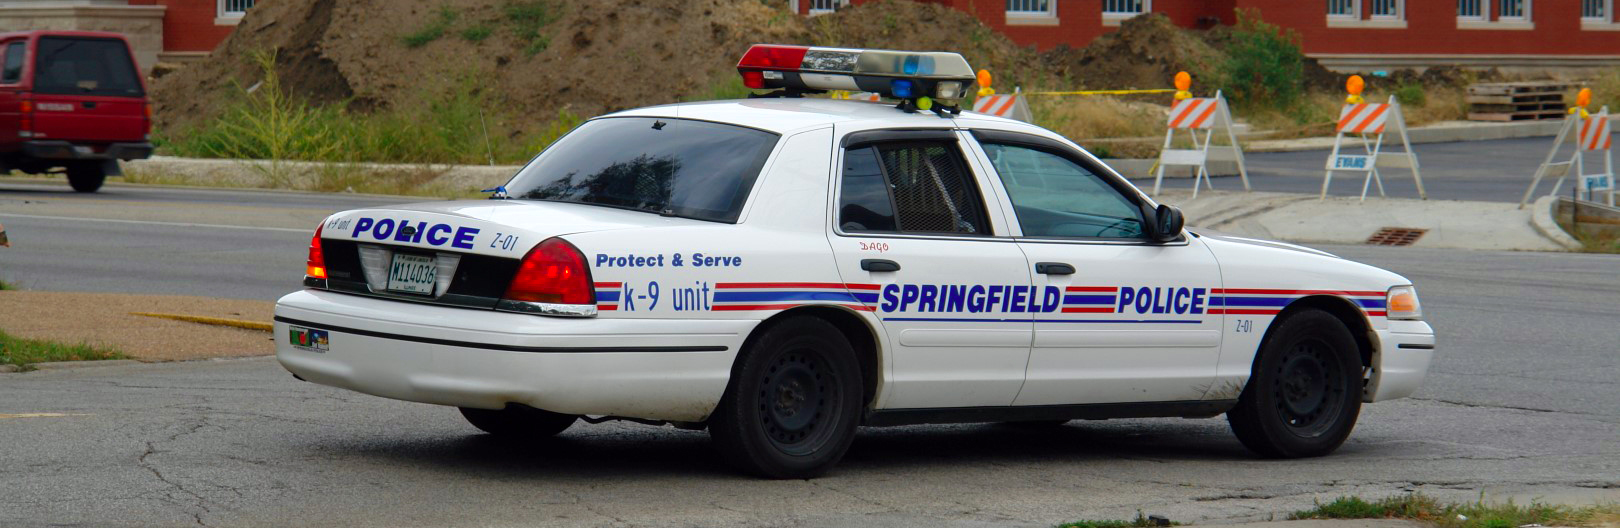 Dónde está Springfield , Illinois, Estados Unidos, Los Simpsons dónde está springfield - 30190870954 64e05a003d o - ¿Dónde está Springfield?, yo ya he estado.